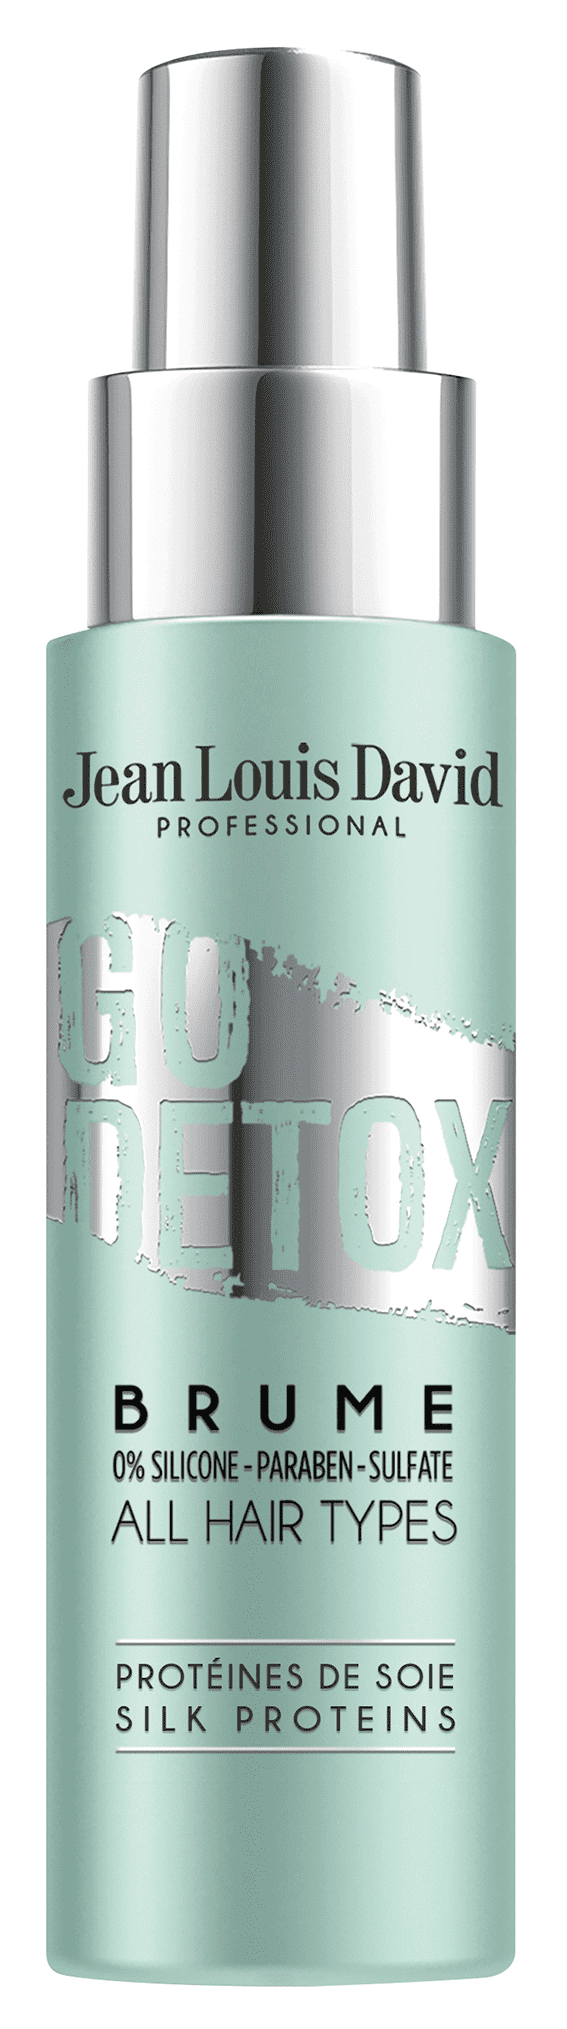 Go Detox Brume Senza Risciacquo, Jean Louis David